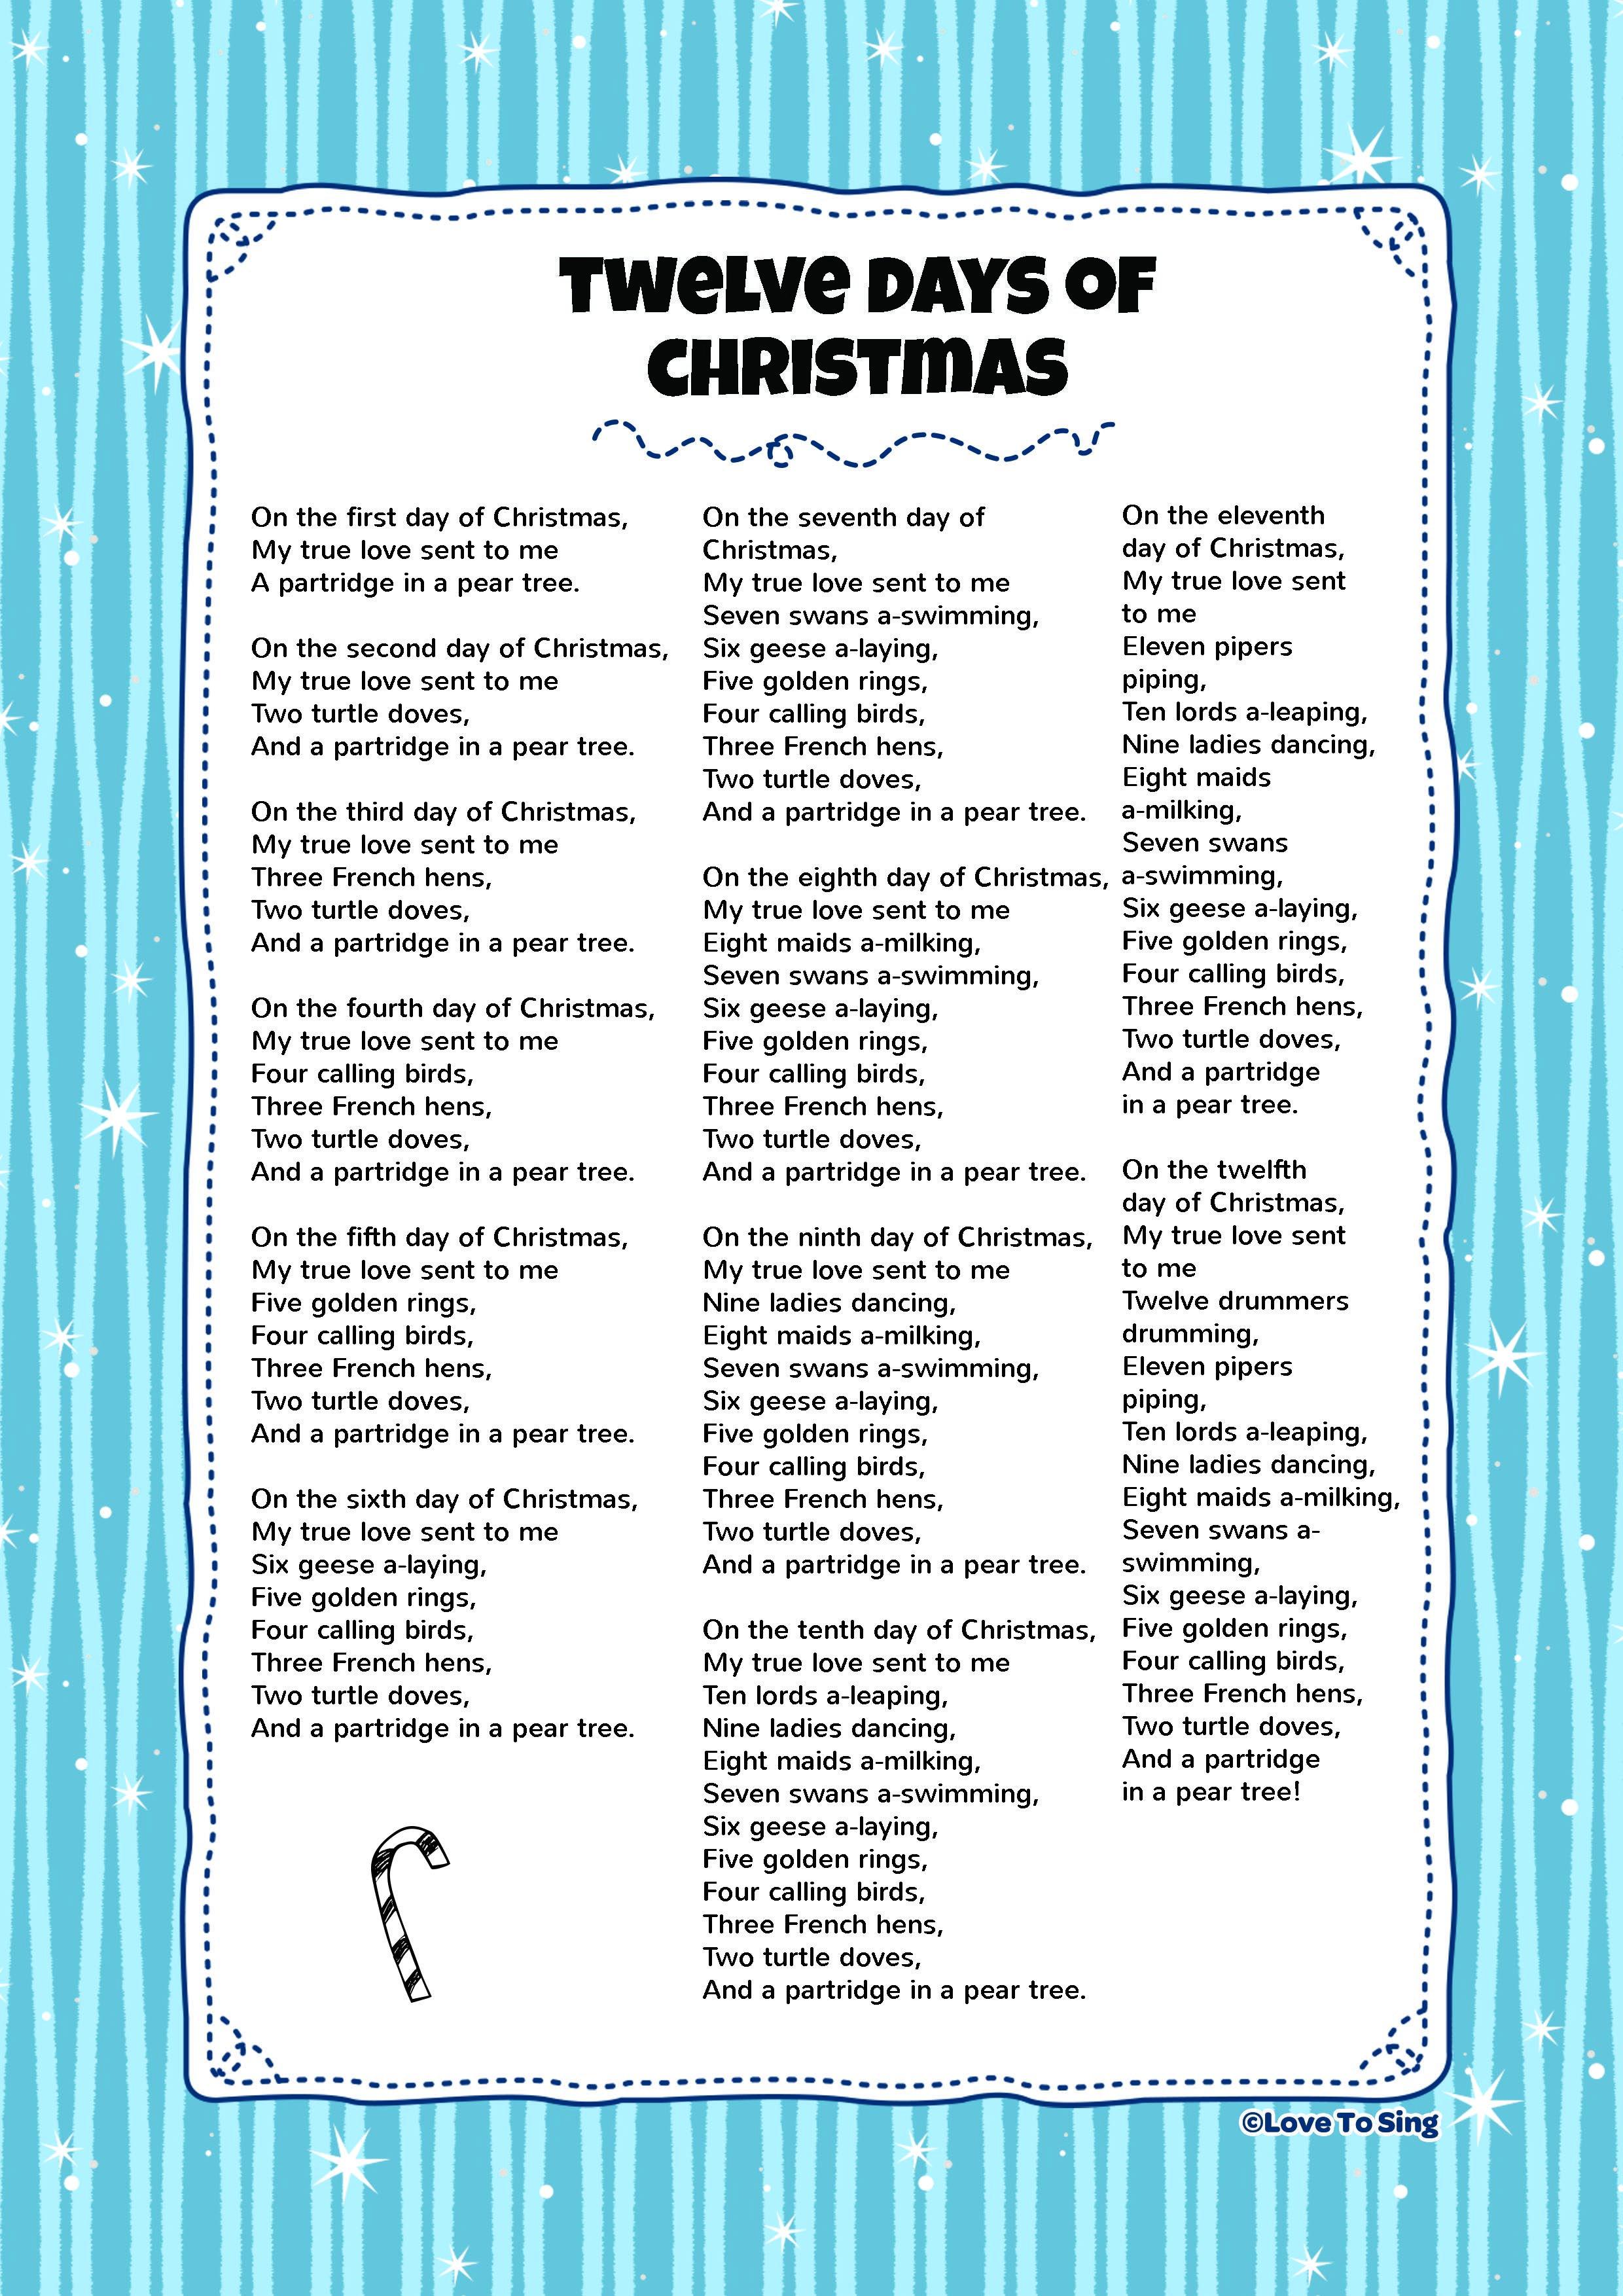 Twelve Days Of Christmas Kids Video Song With Free Lyrics Activities Christmas Songs Lyrics Christmas Lyrics Twelve Days Of Christmas [ 3508 x 2480 Pixel ]